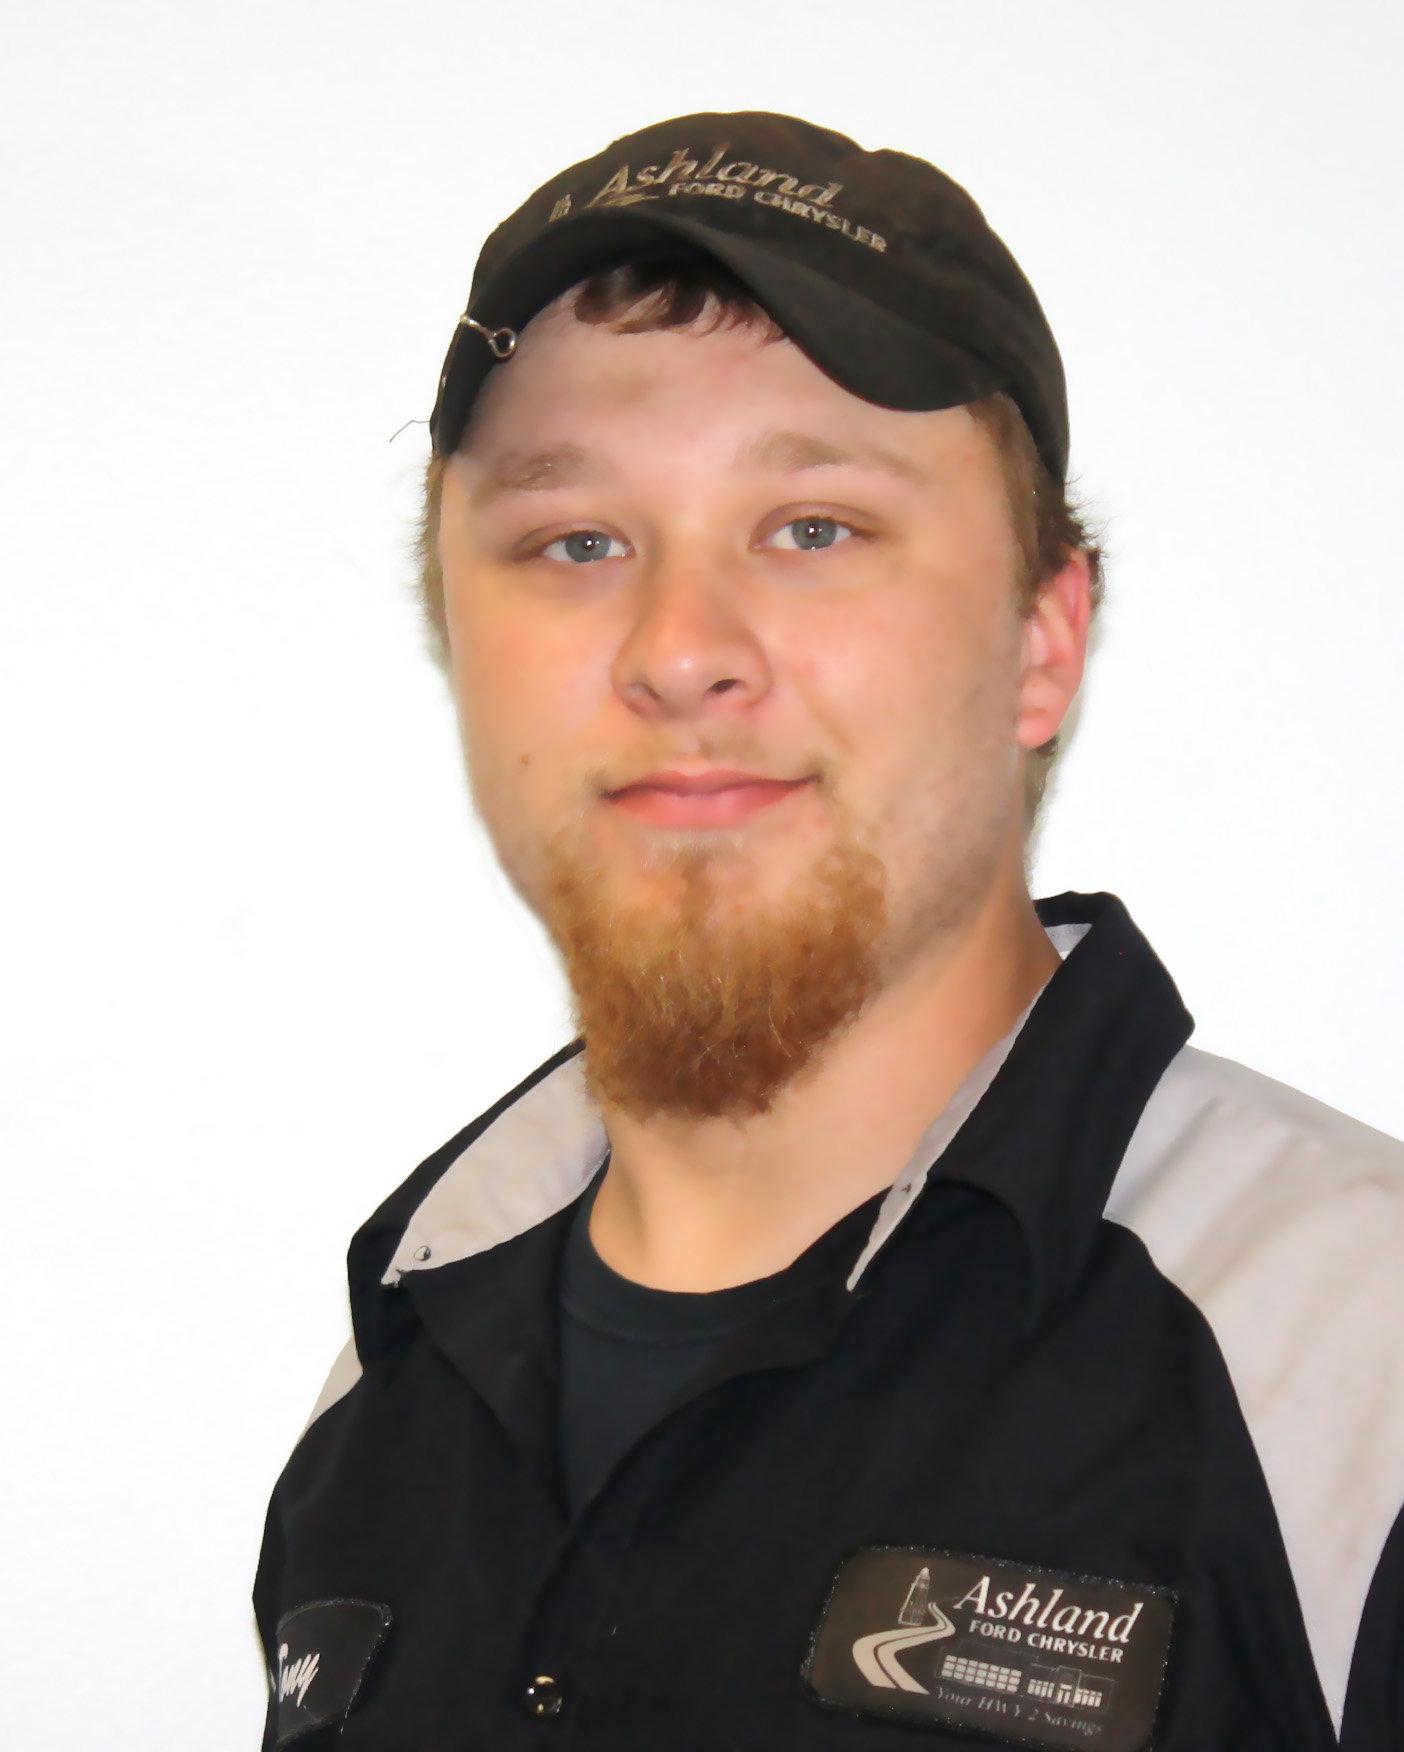 Tony White - Service Technician